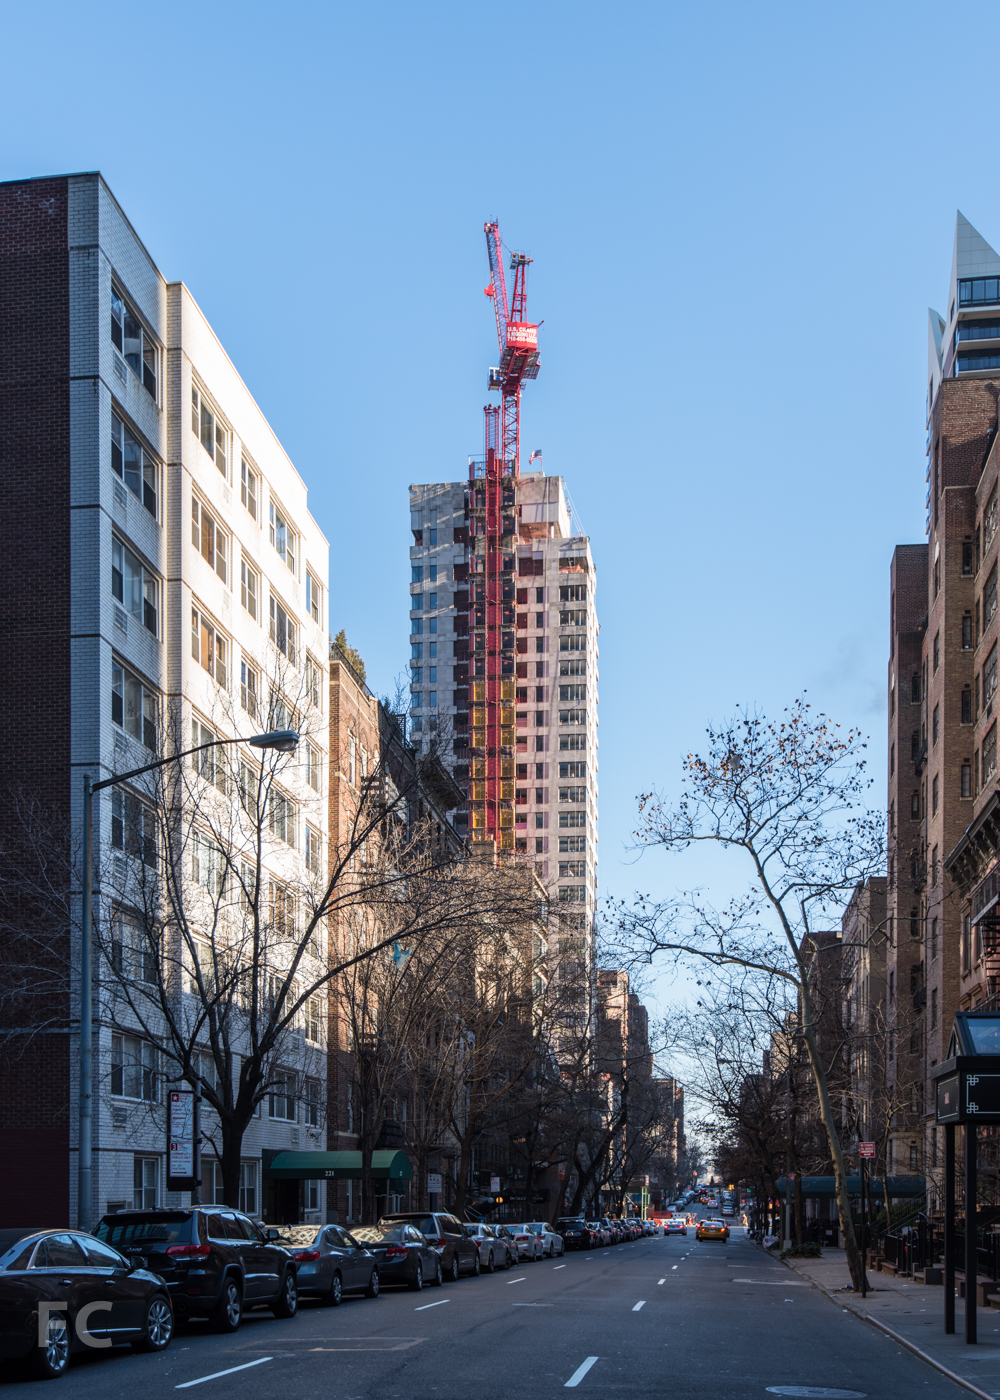 Looking east on East50th Street.